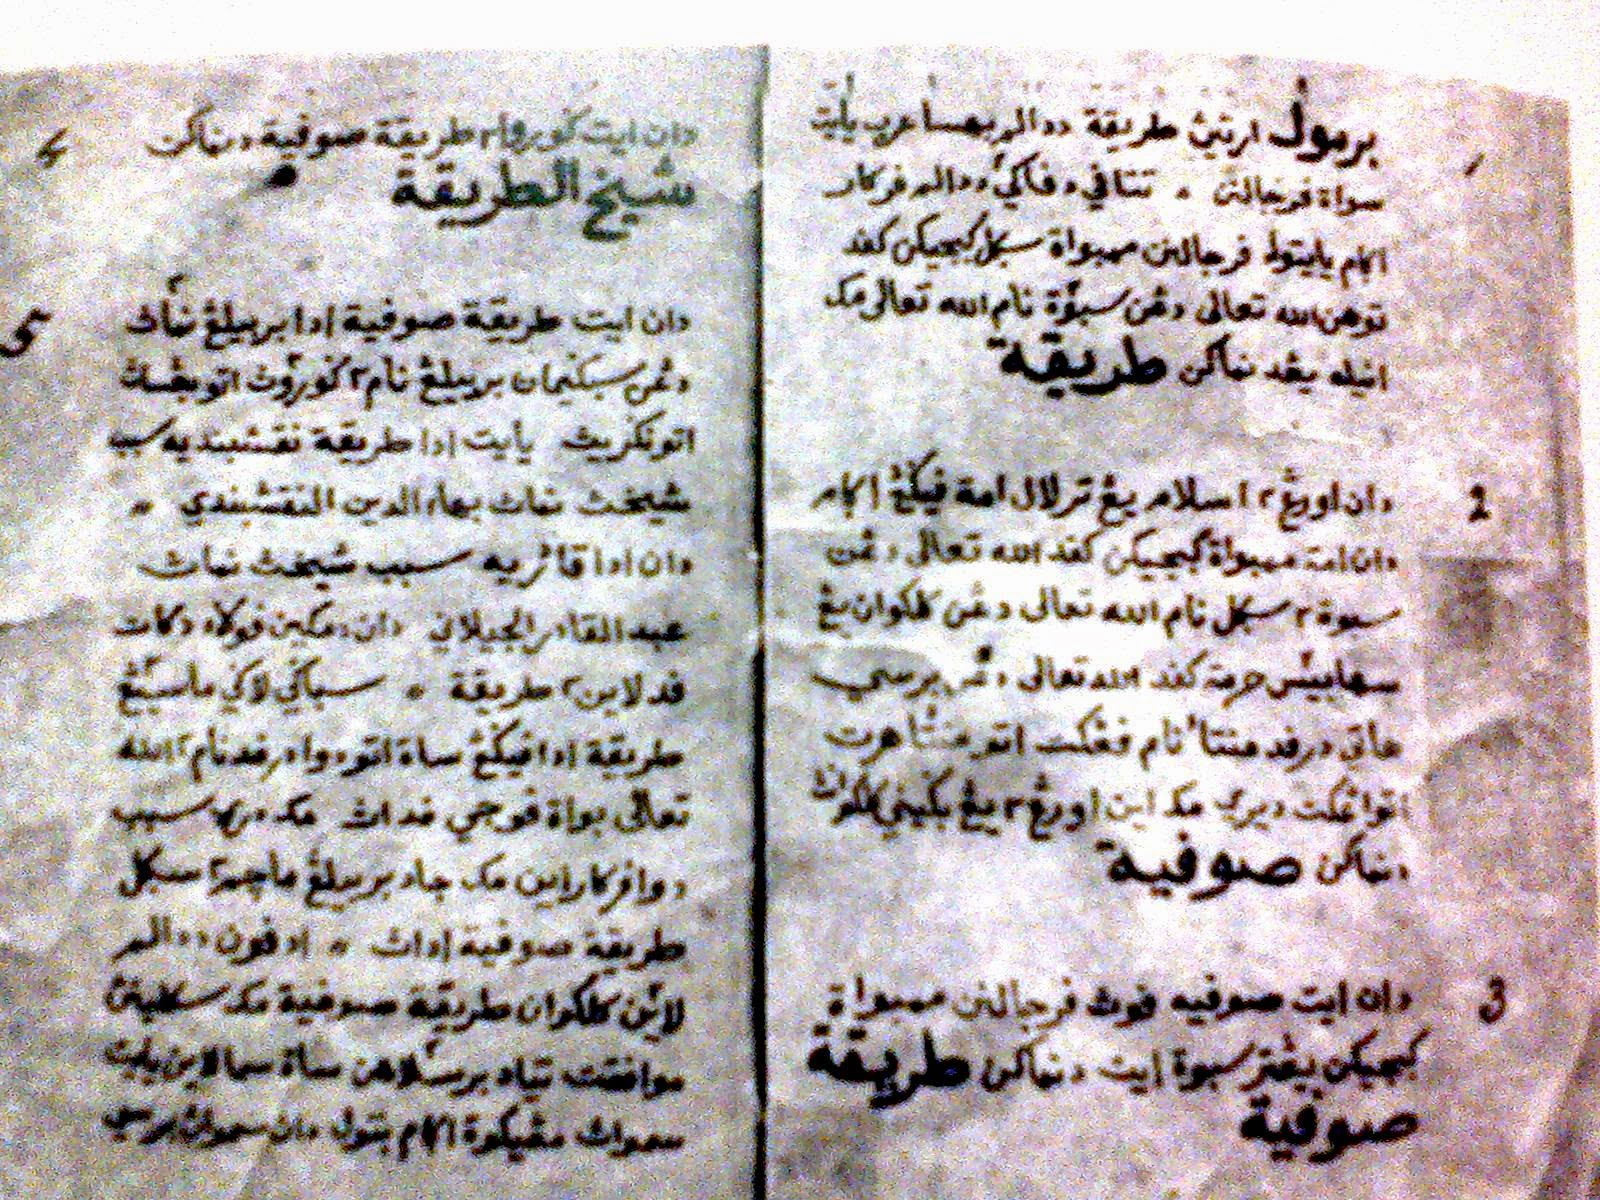 batavia muslim List of massacres in indonesia deaths notes 1740 batavia massacre: october–november 1740: batavia: 10,000 in the sambas riots in 1999 muslim.